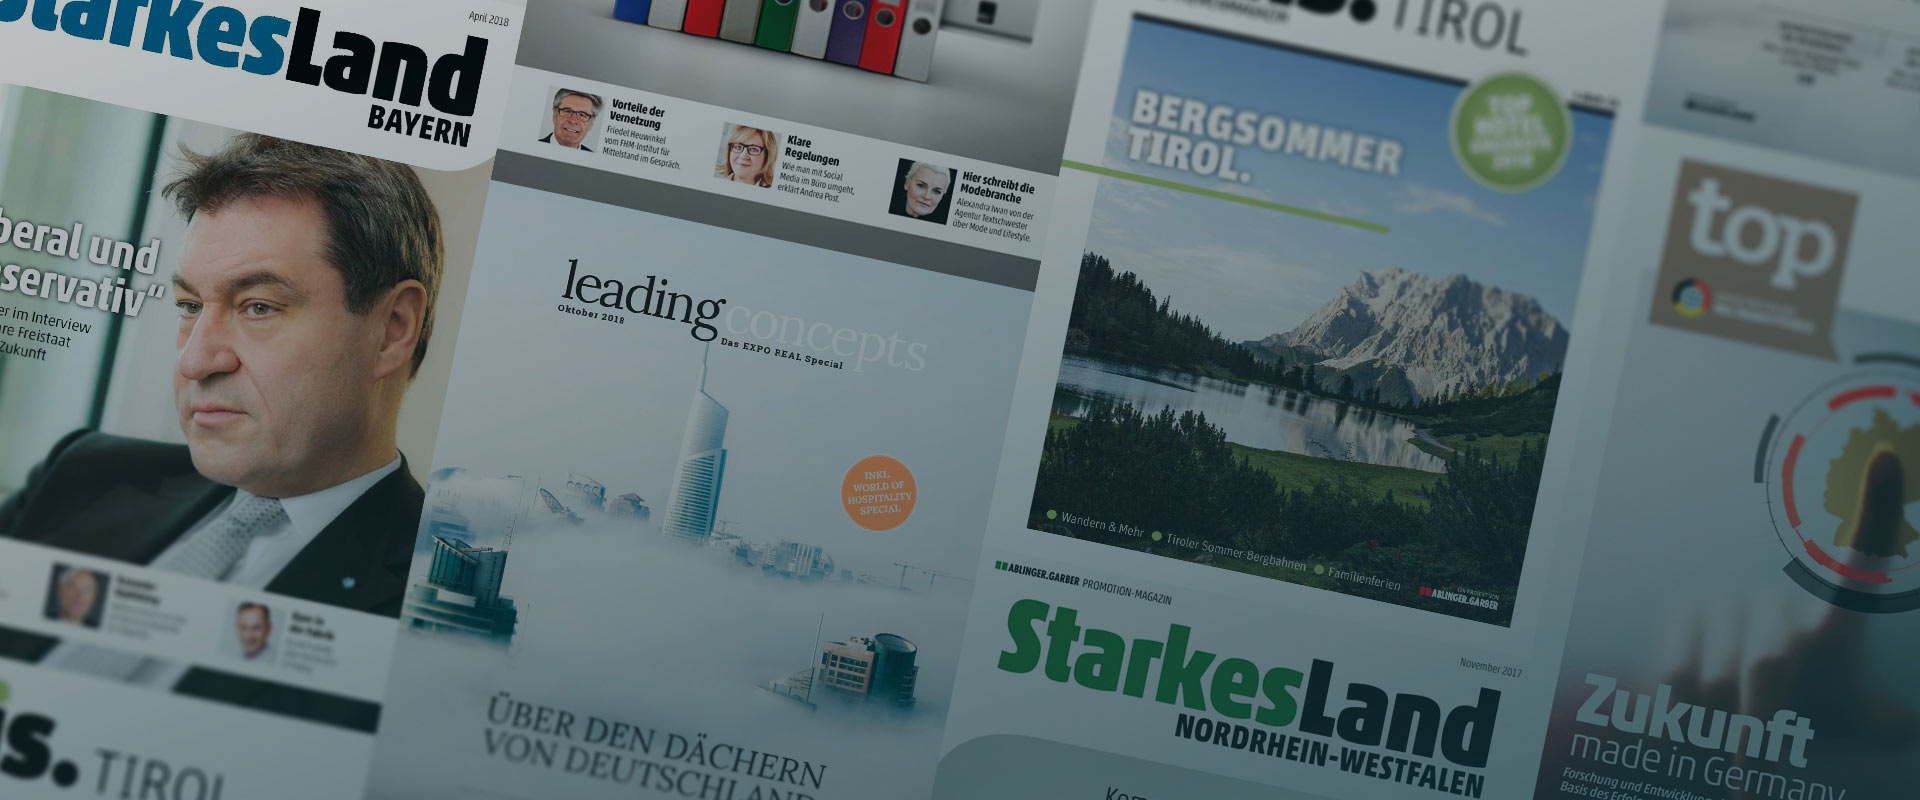 Ablinger Garber - Wir Schaffen Umfeld - Magazine